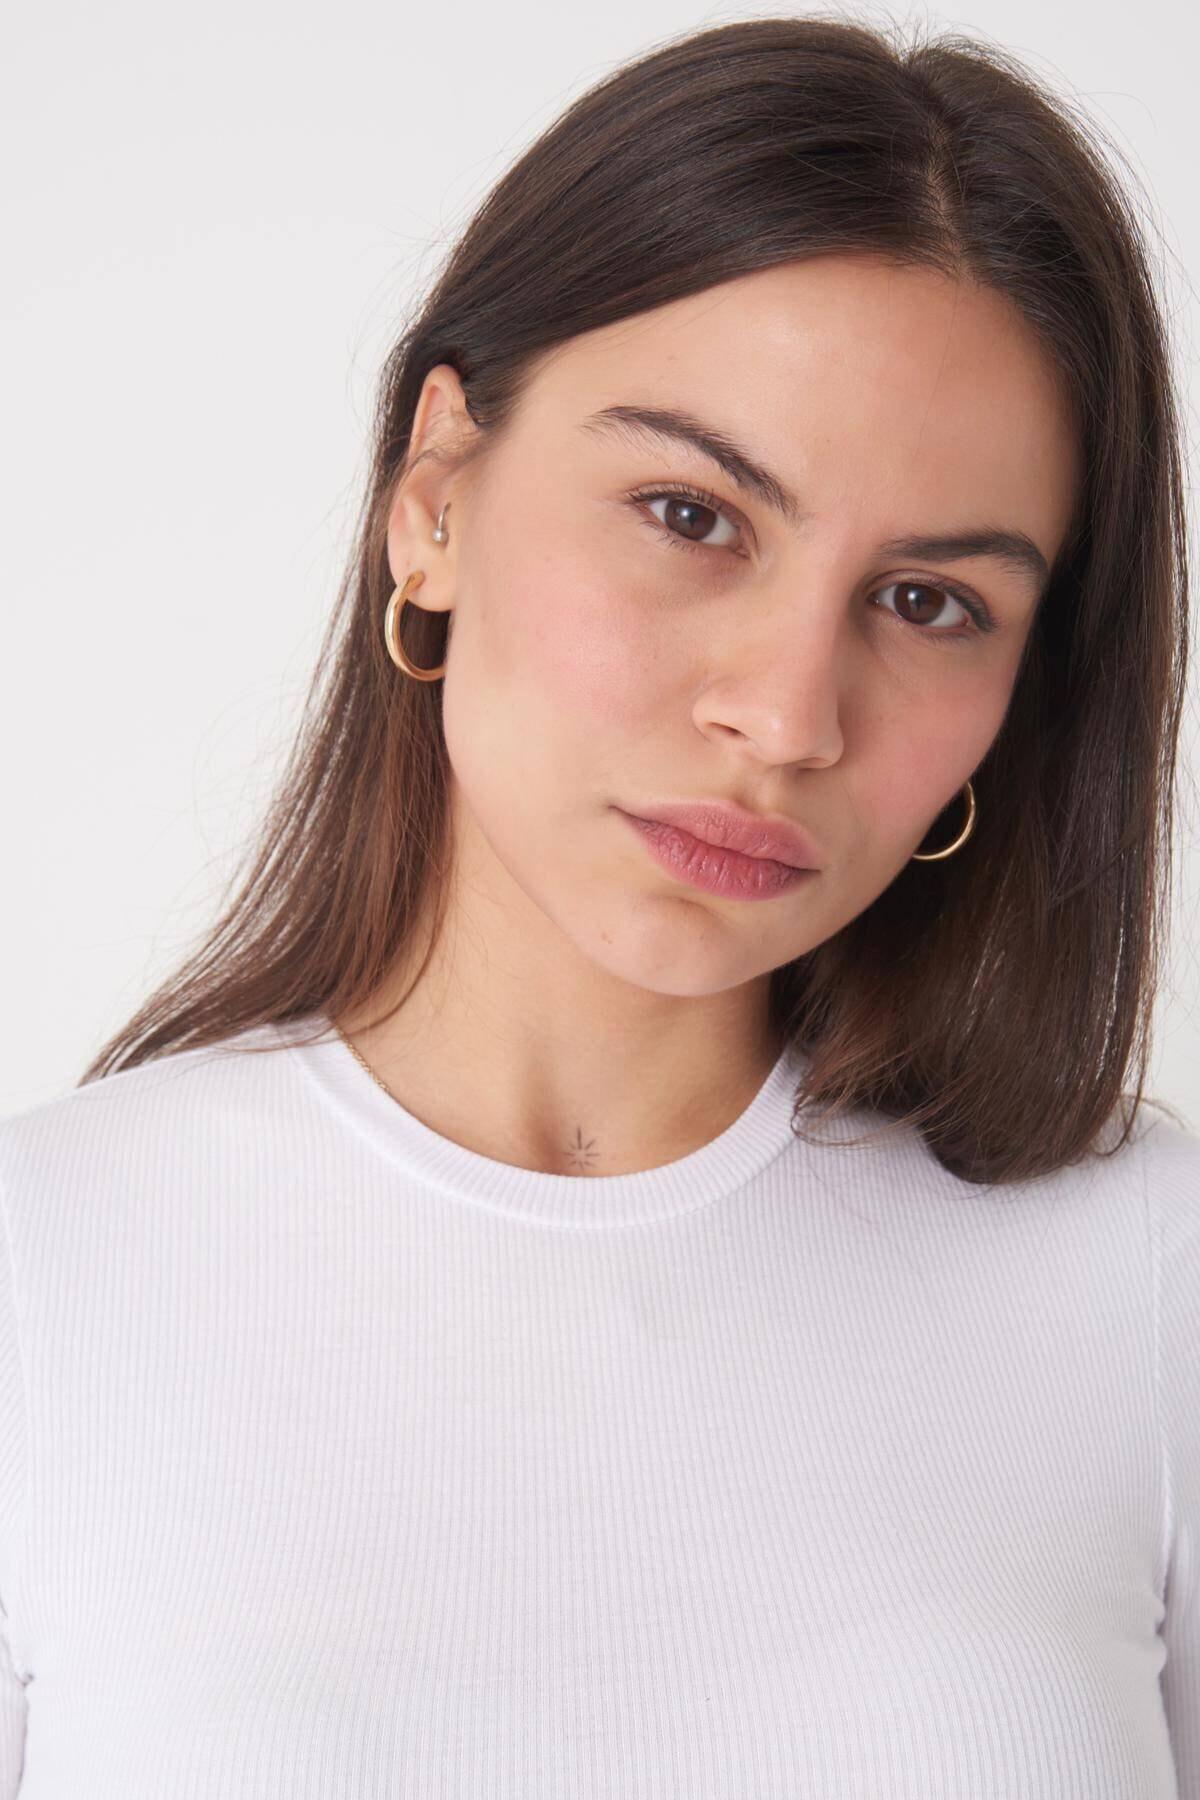 Addax Kadın Beyaz Uzun Kollu Bluz P1017 - K12 ADX-0000022662 3